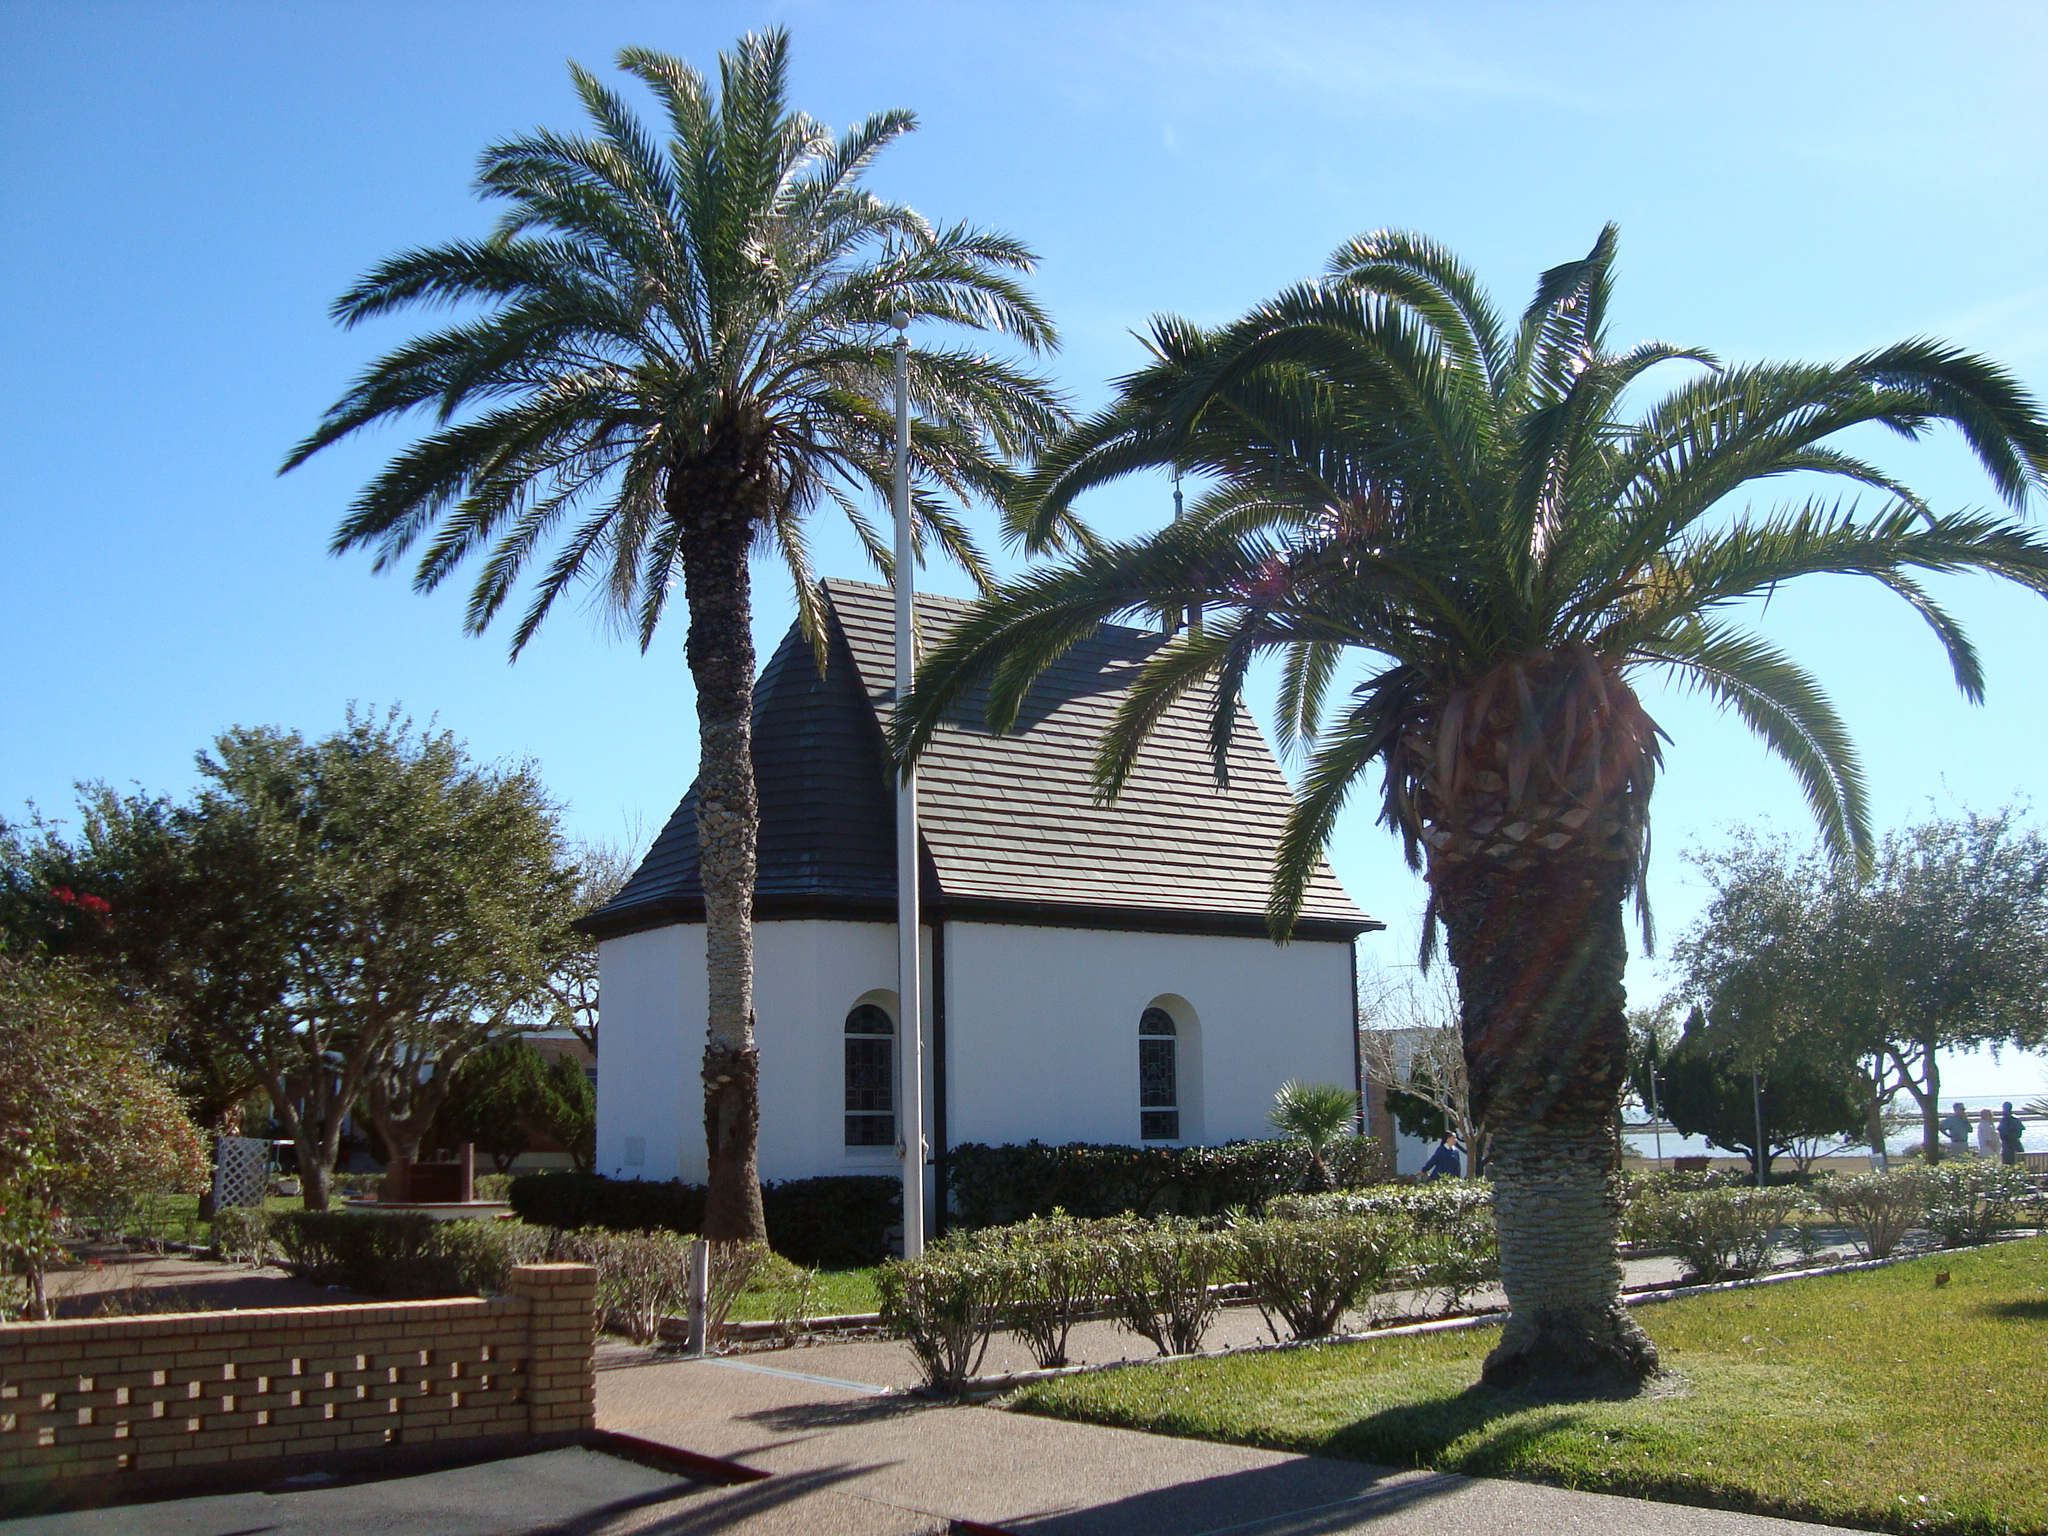 The Shrine at Lamar Schoenstatt Lamar TX USA 2048x1536